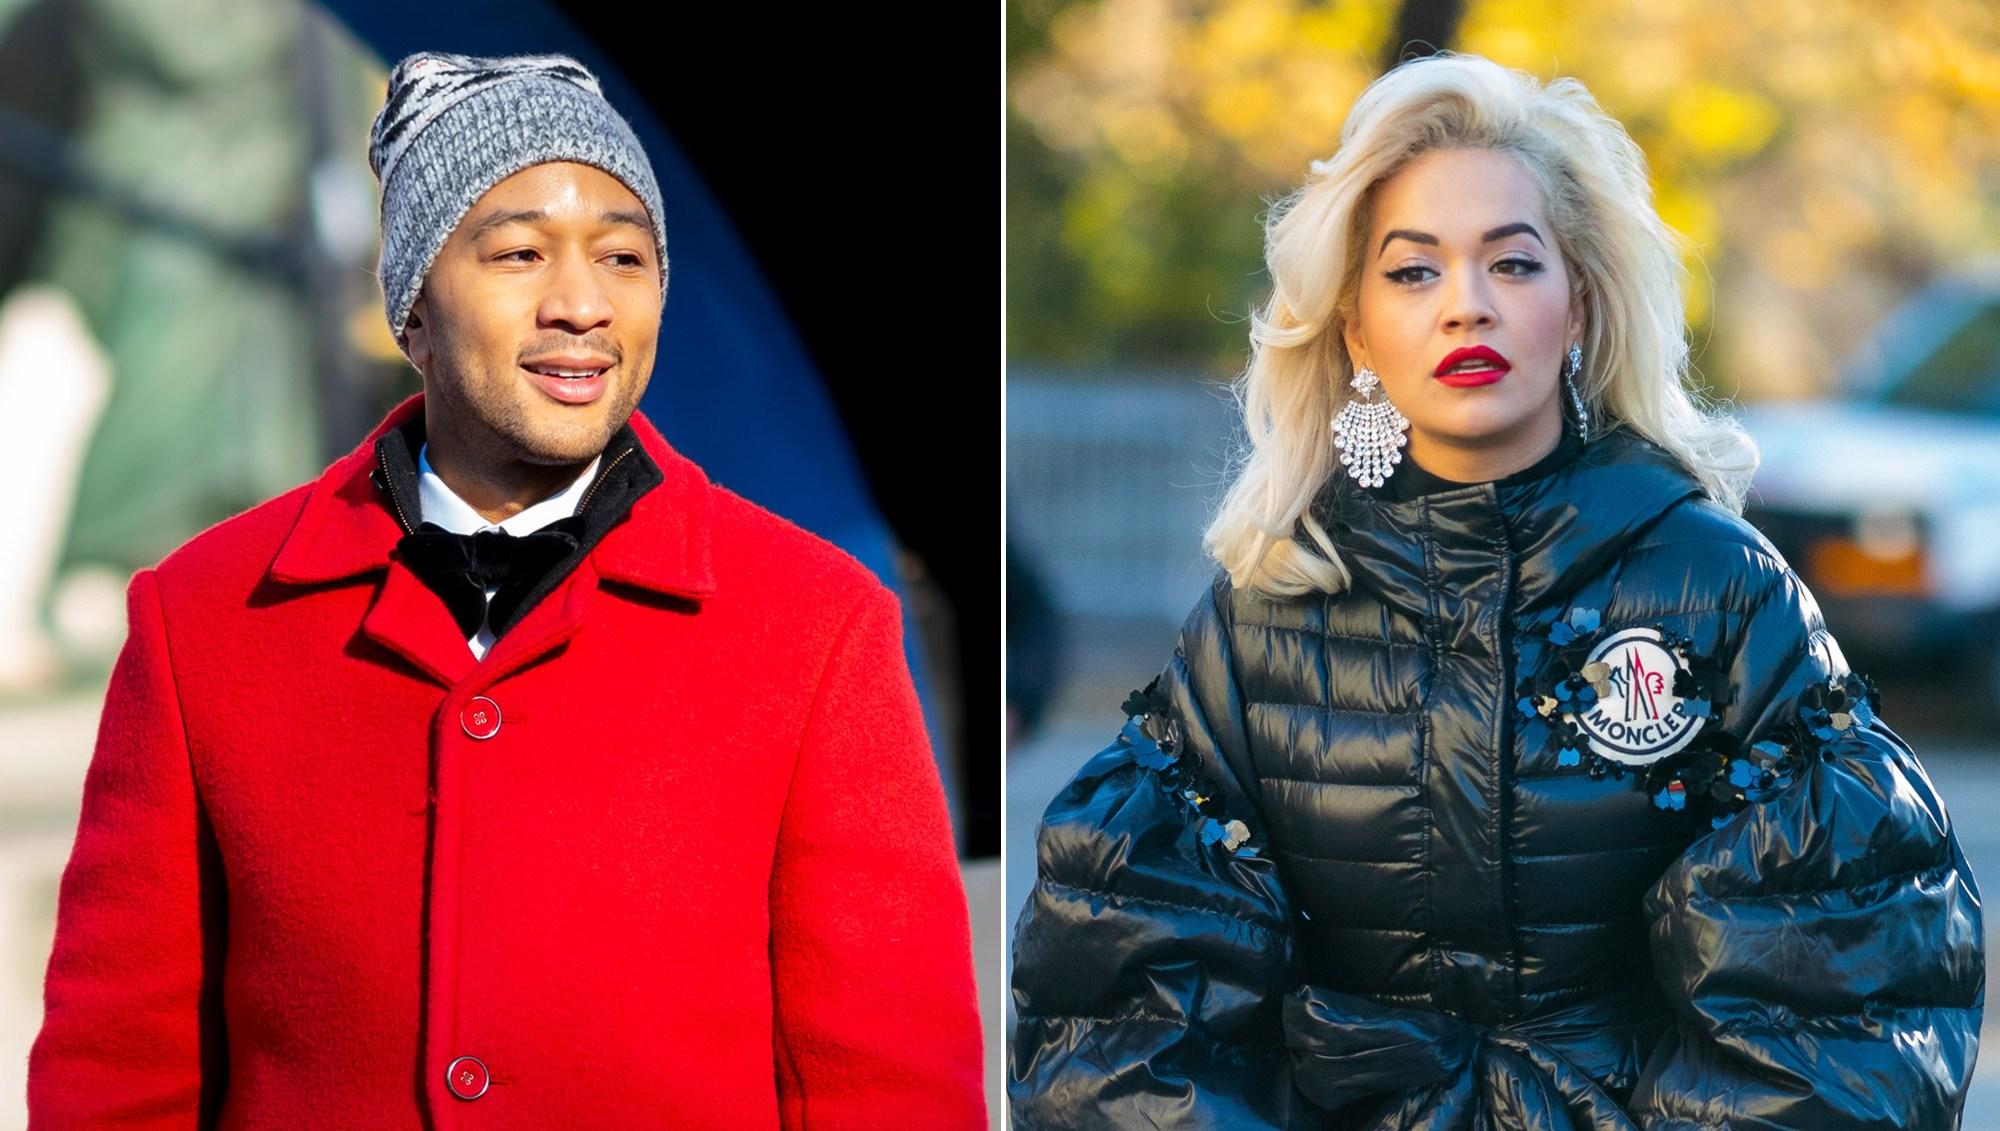 John Legend Defends Himself, Rita Ora After Macy's Day Parade Backlash